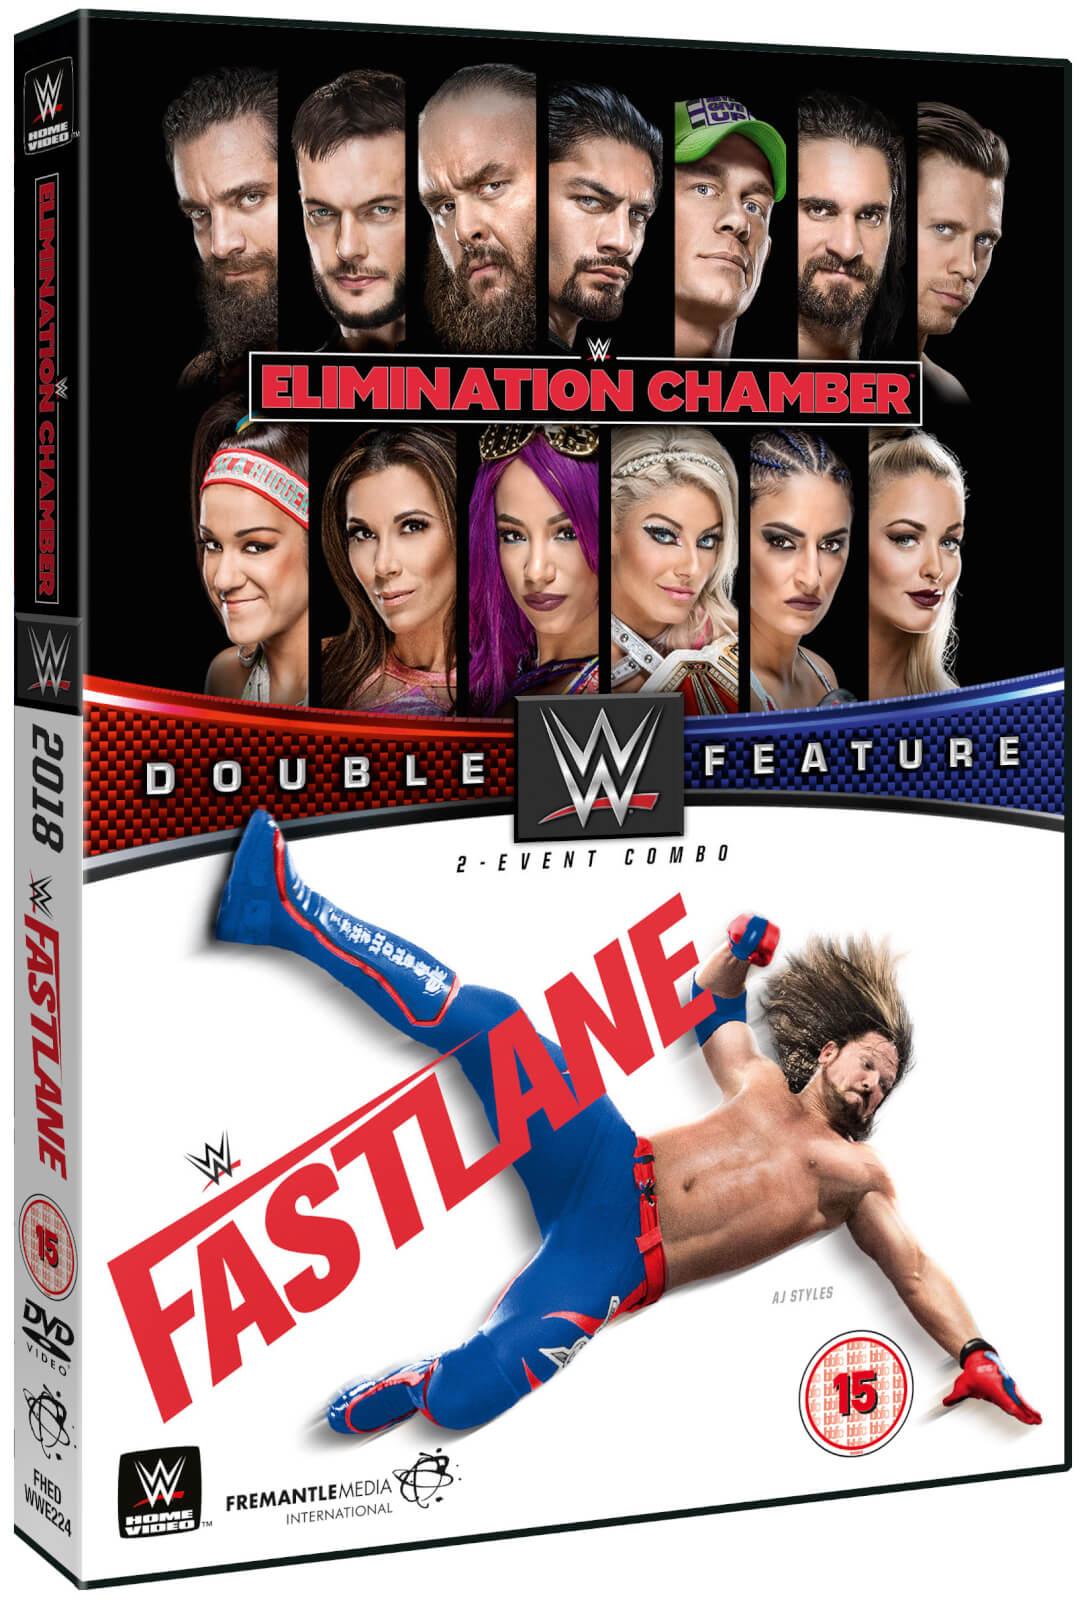 WWE: Elimination Chamber 2018 + Fastlane 2018 Double Feature